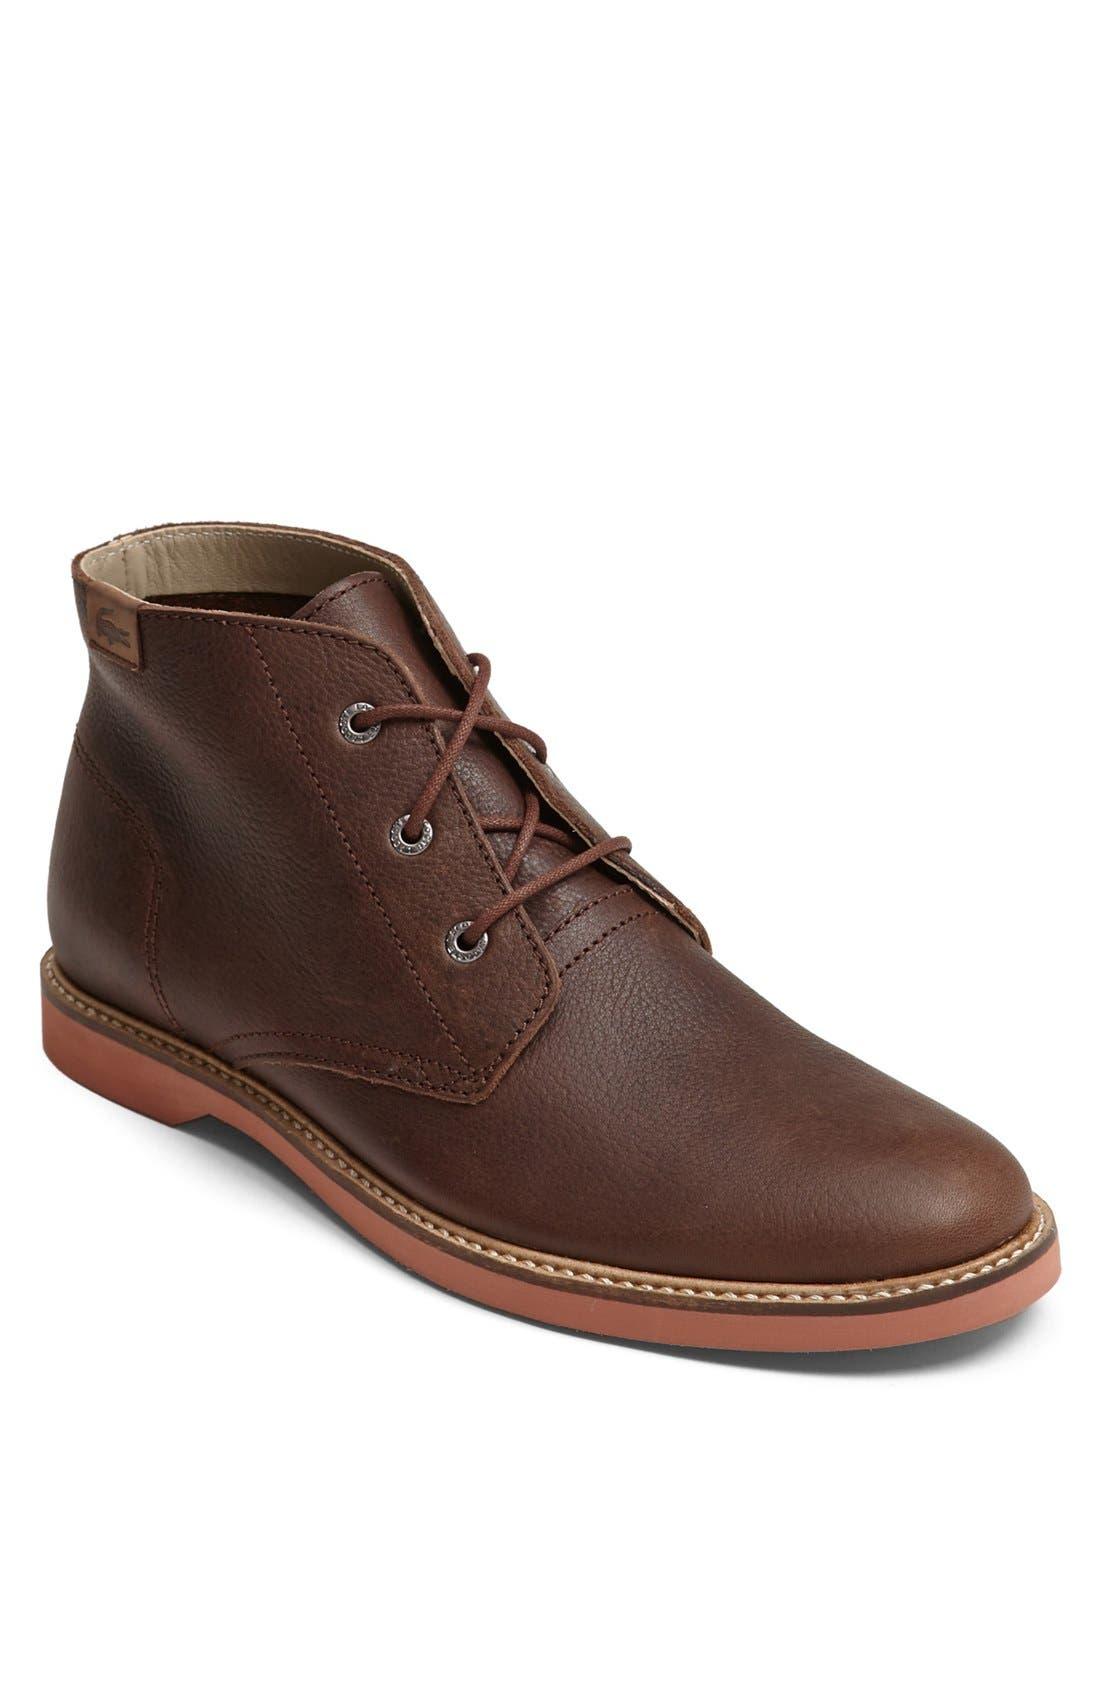 Main Image - Lacoste 'Sherbrooke Hi' Boot